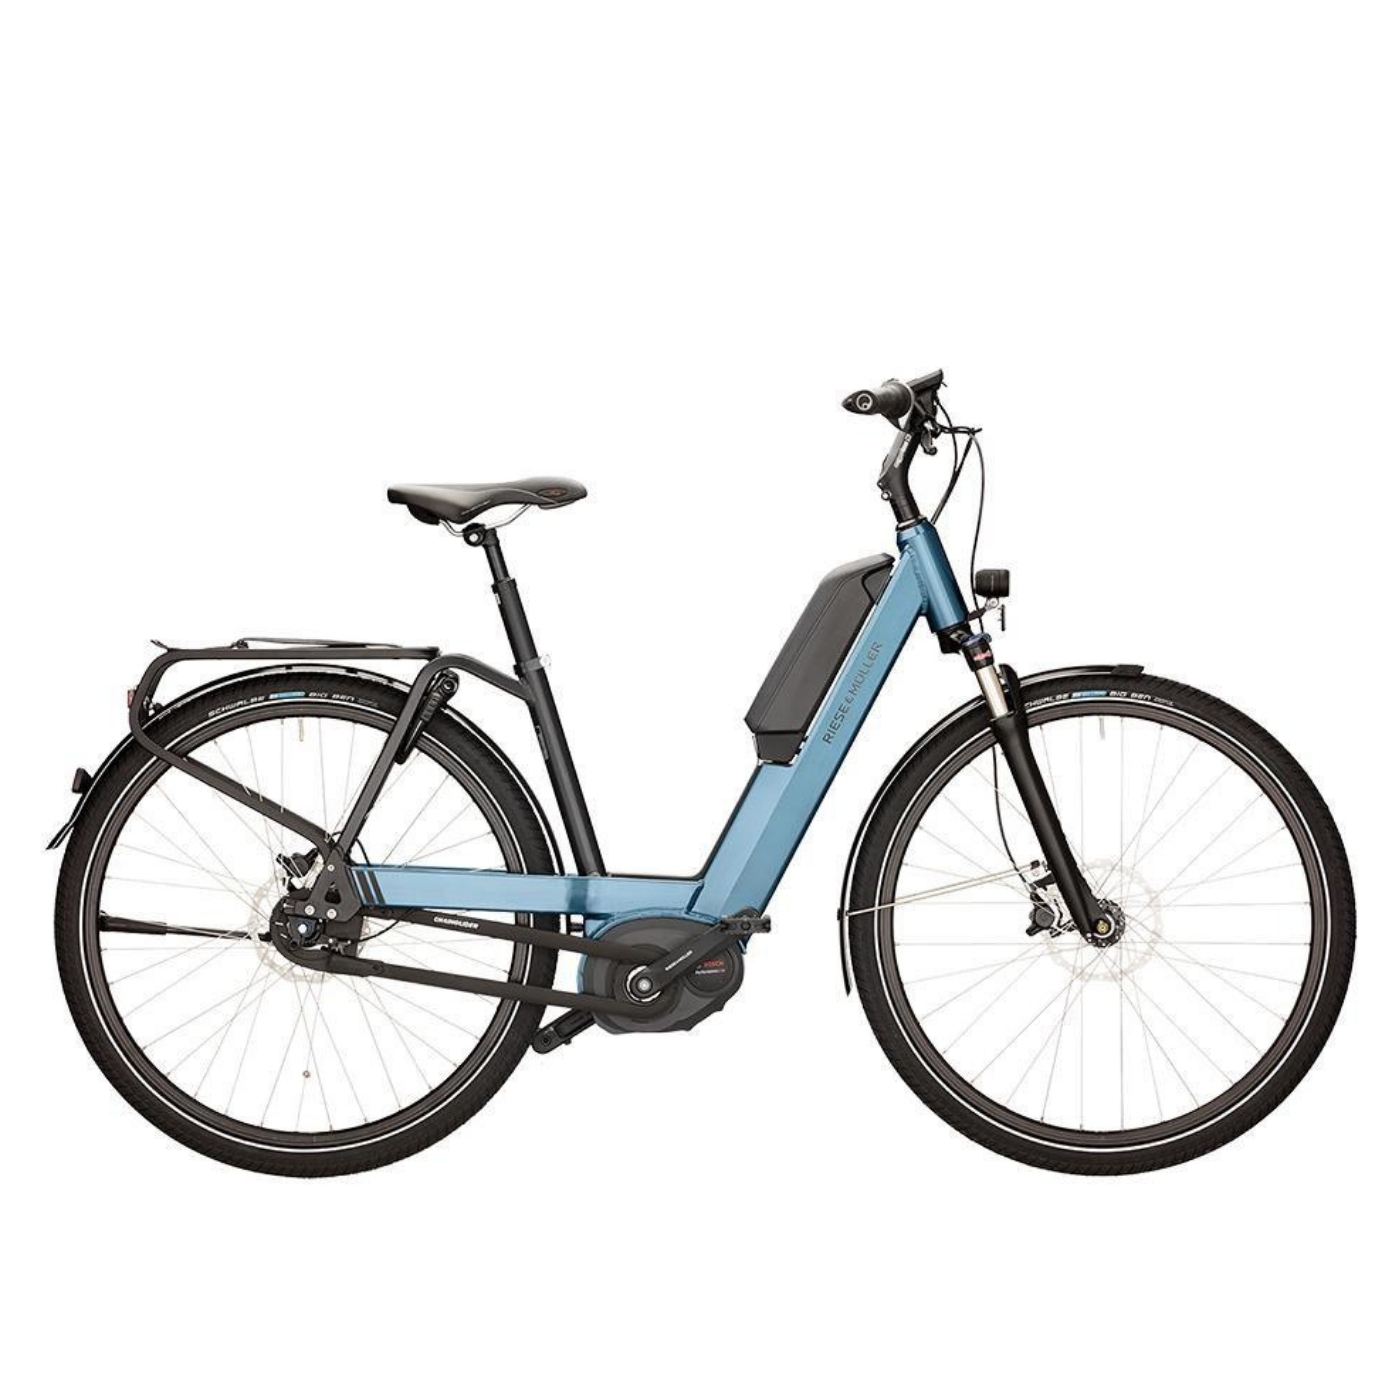 Riese & Müller Nevo City • e-bike lovers